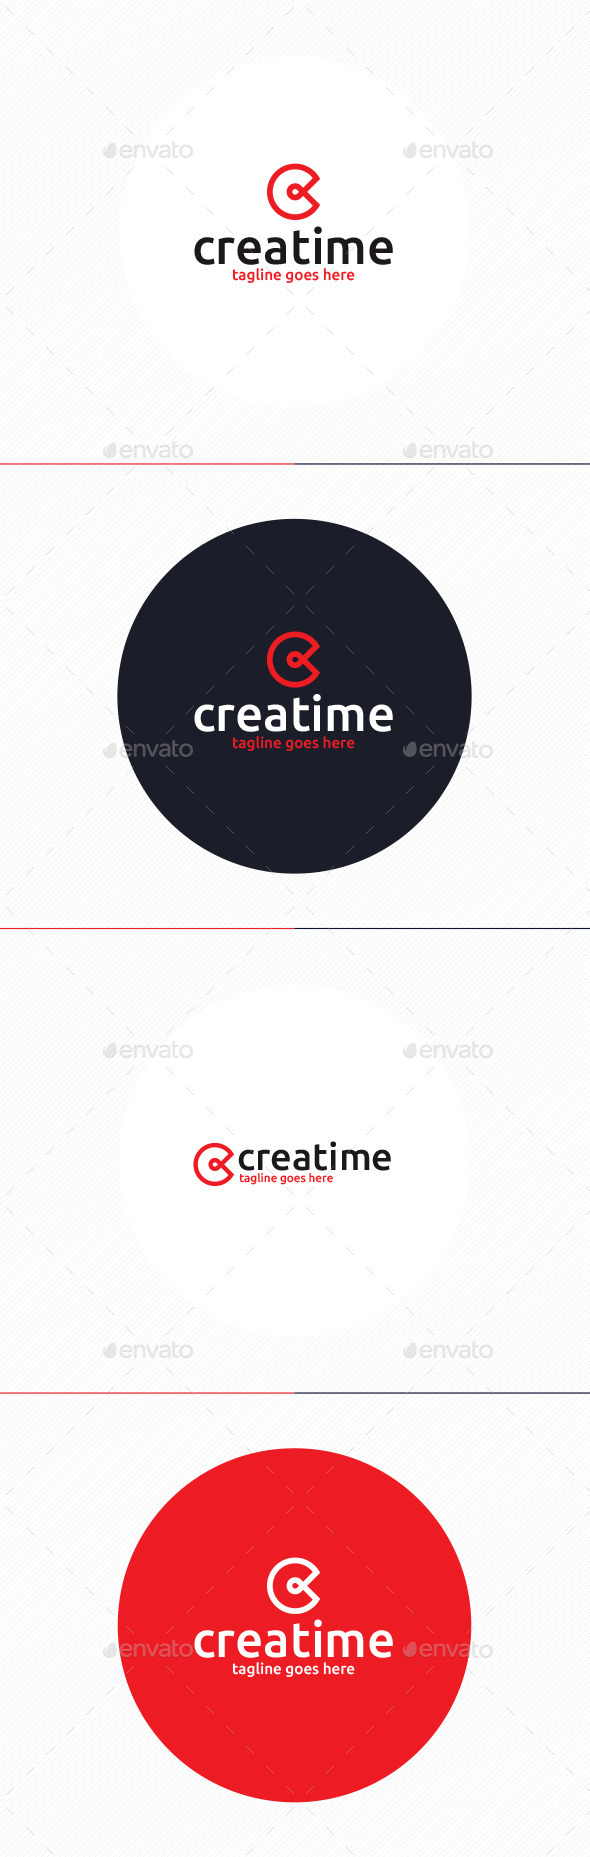 GraphicRiver Creatime Logo Letter C 10374386